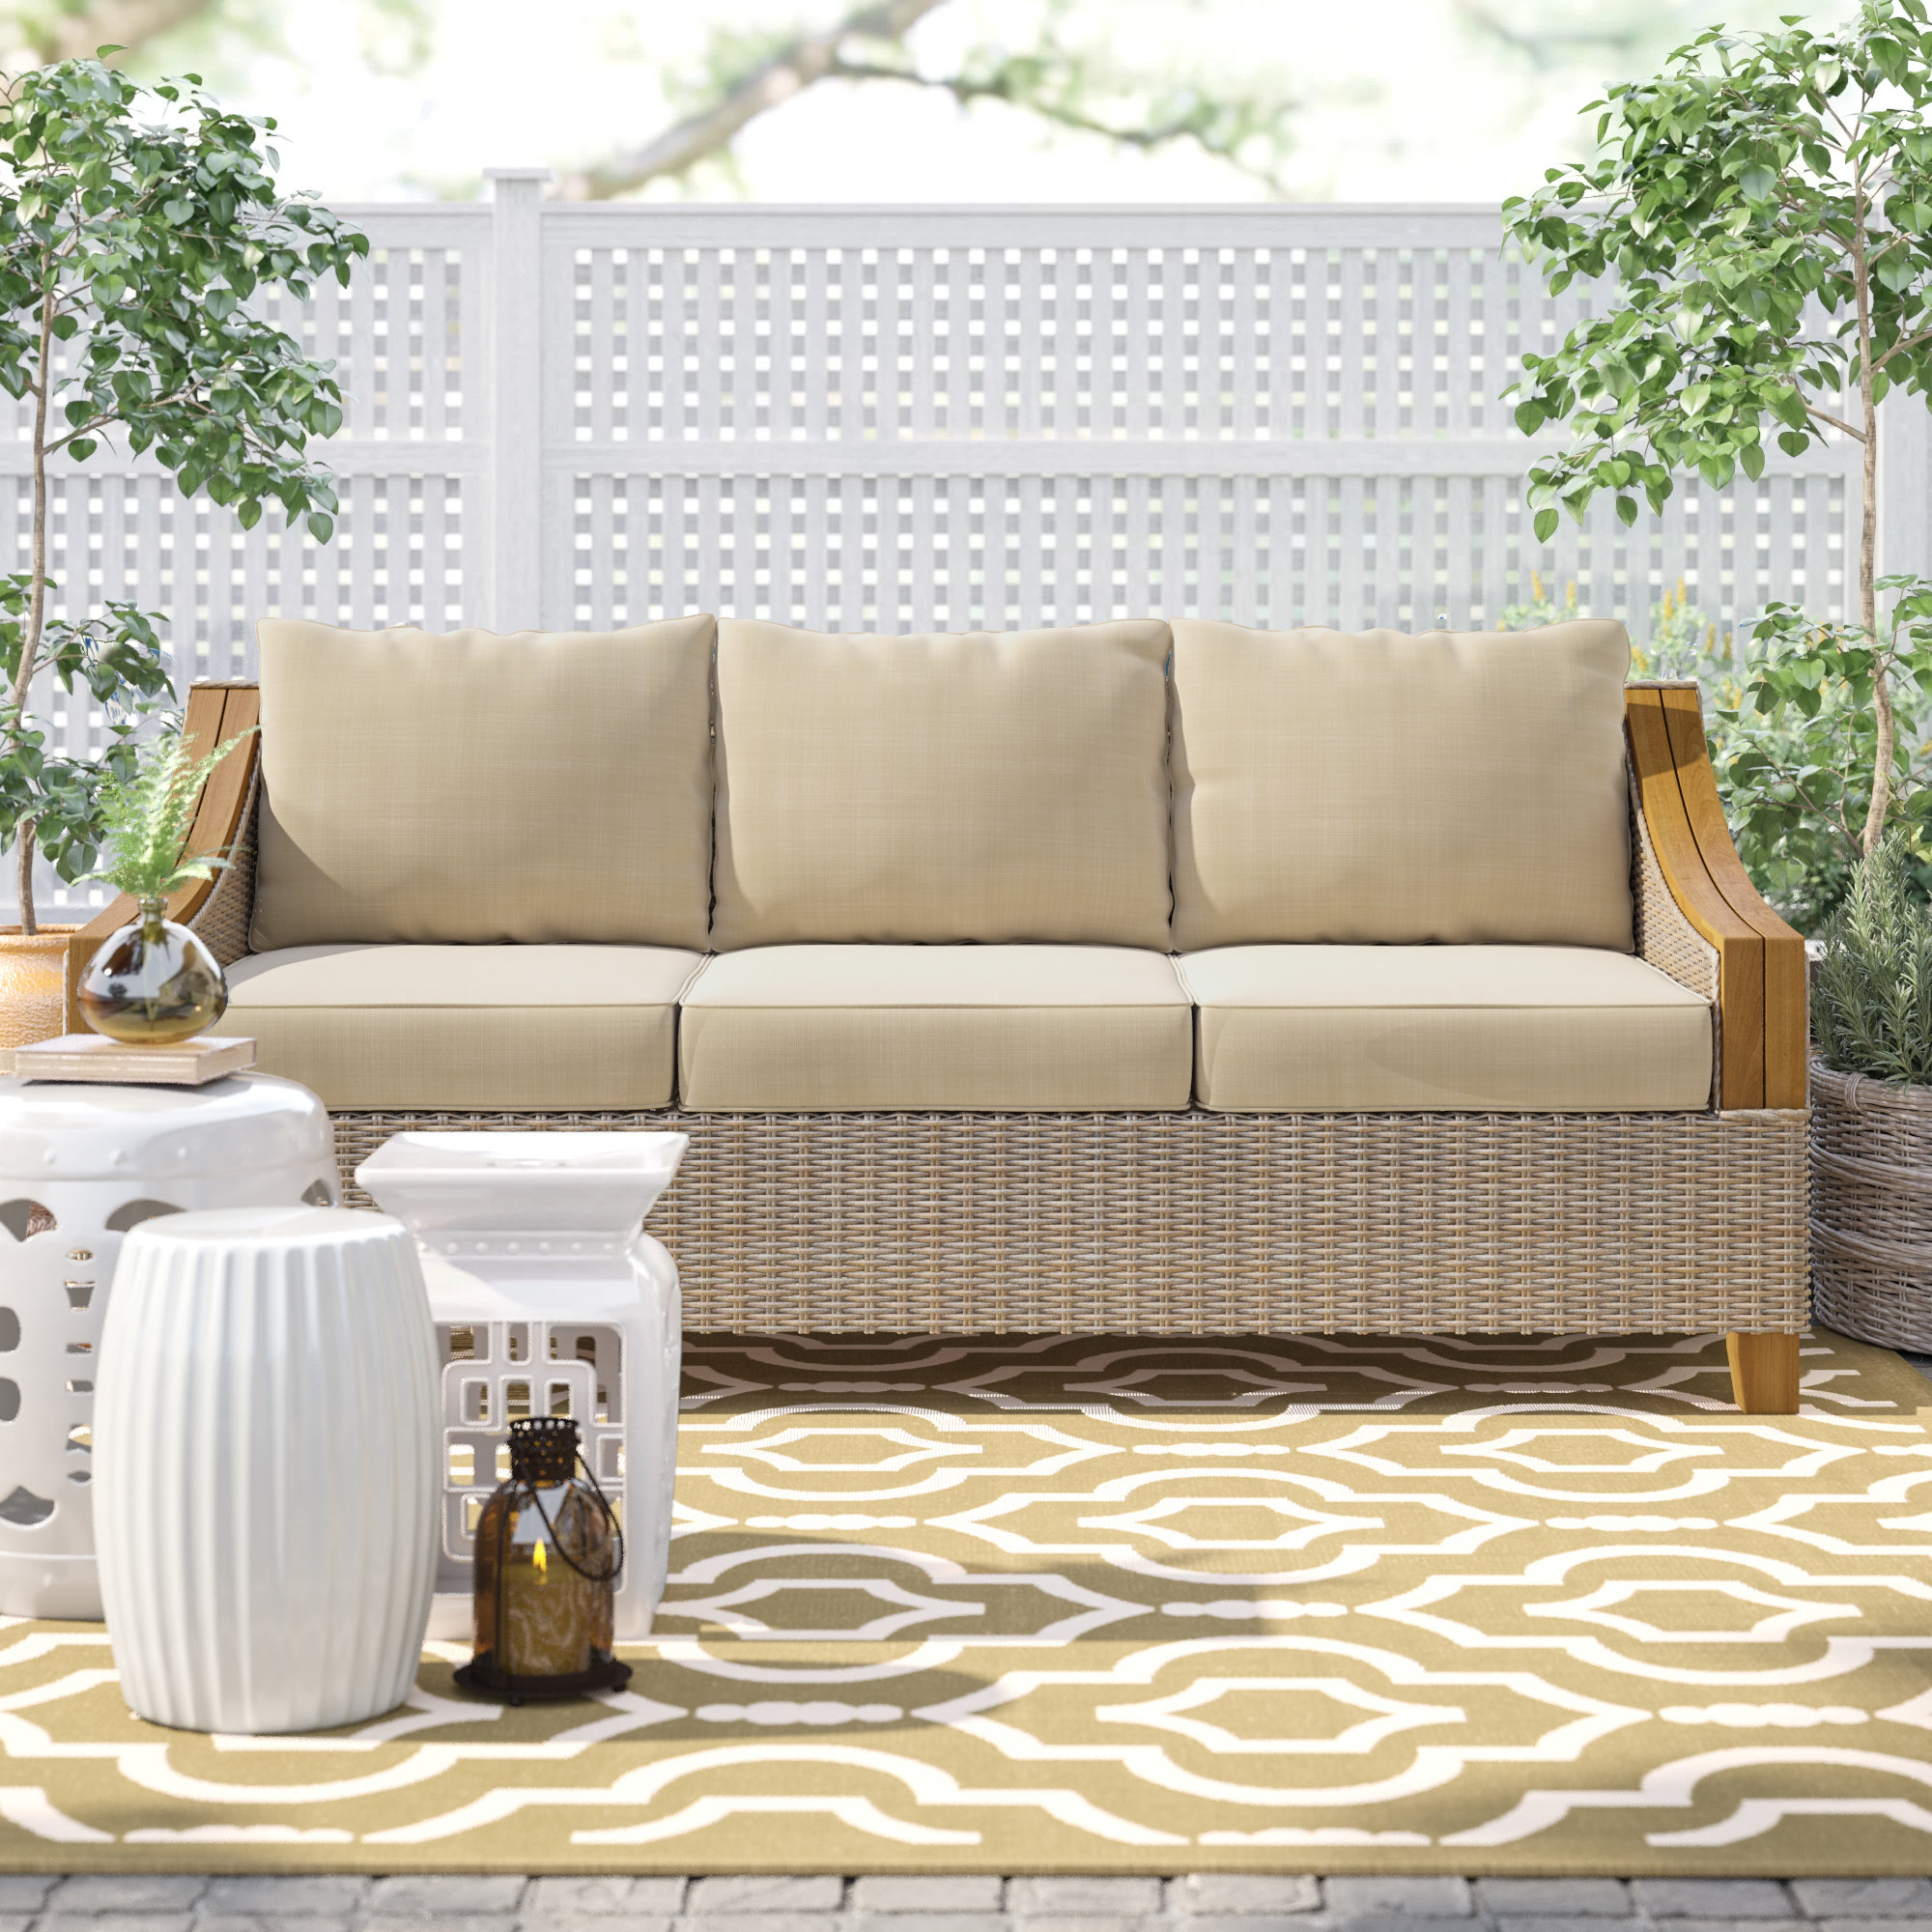 Kincaid Teak Patio Sofa With Sunbrella Cushions Inside Well Known Montford Teak Patio Sofas With Cushions (View 8 of 20)